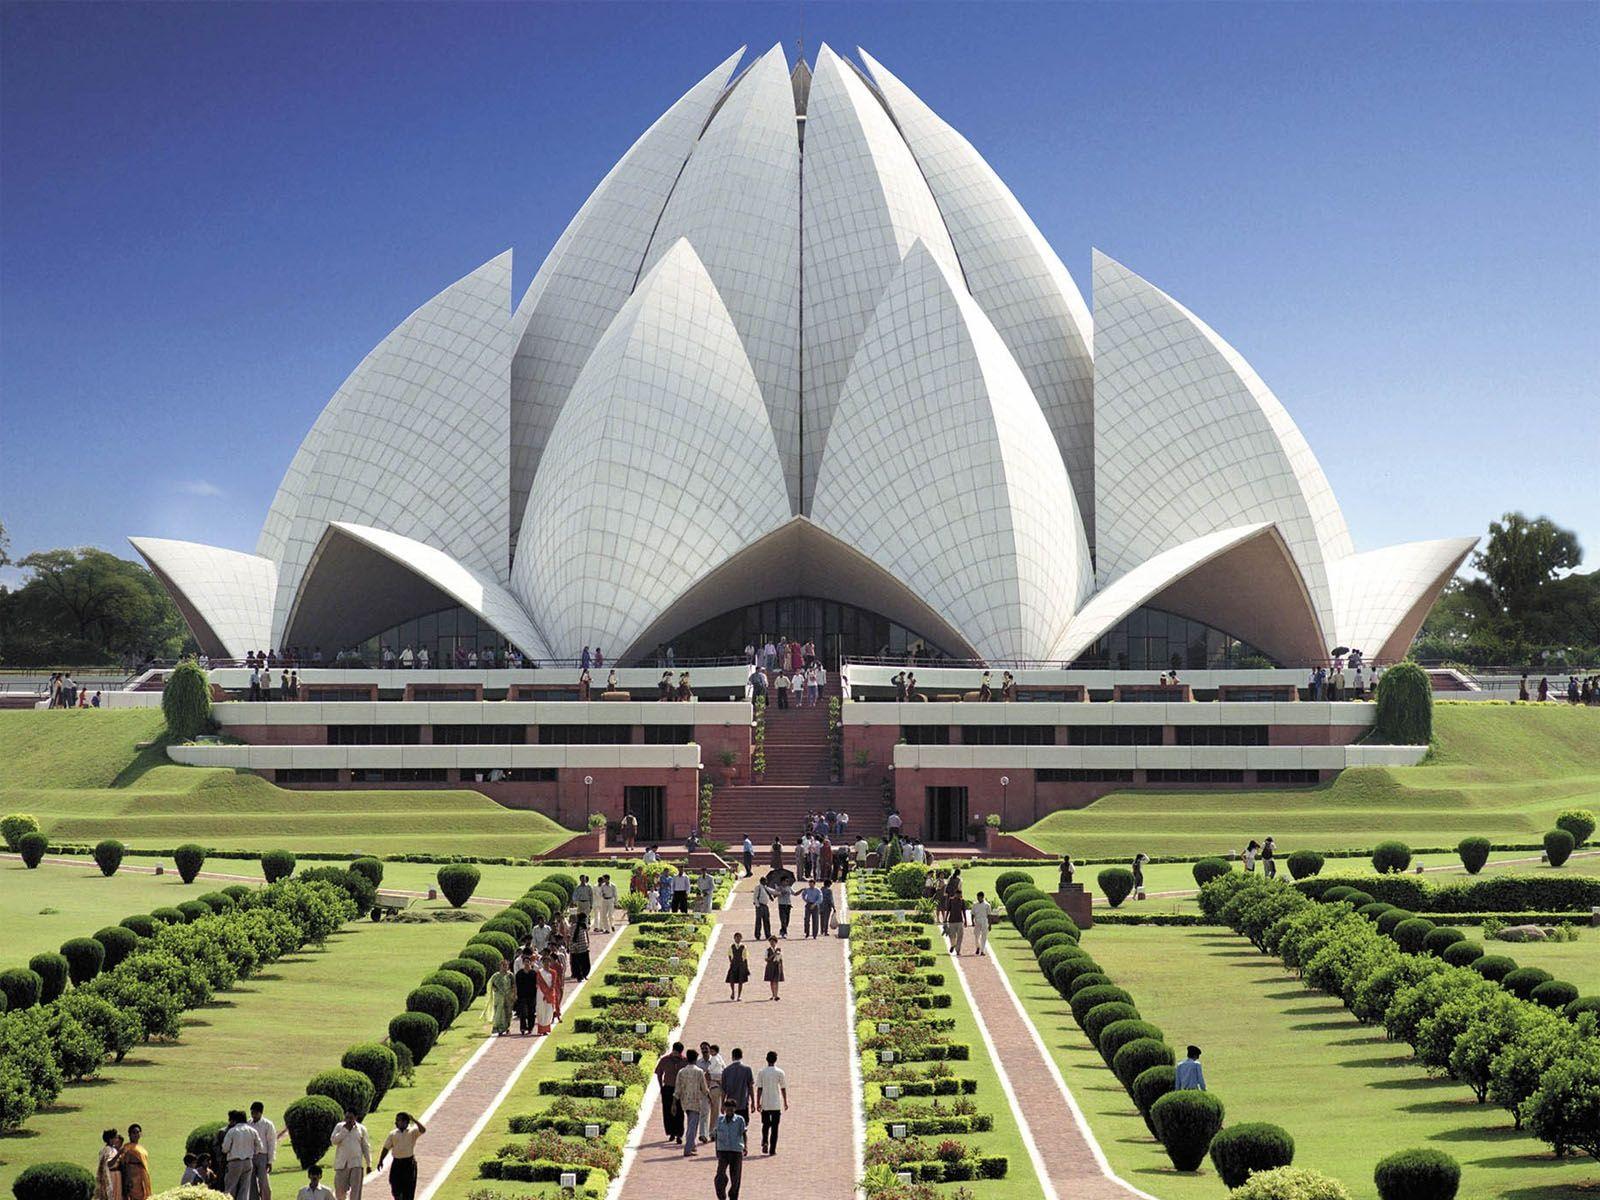 Lotus Temple in India: photos and description 72